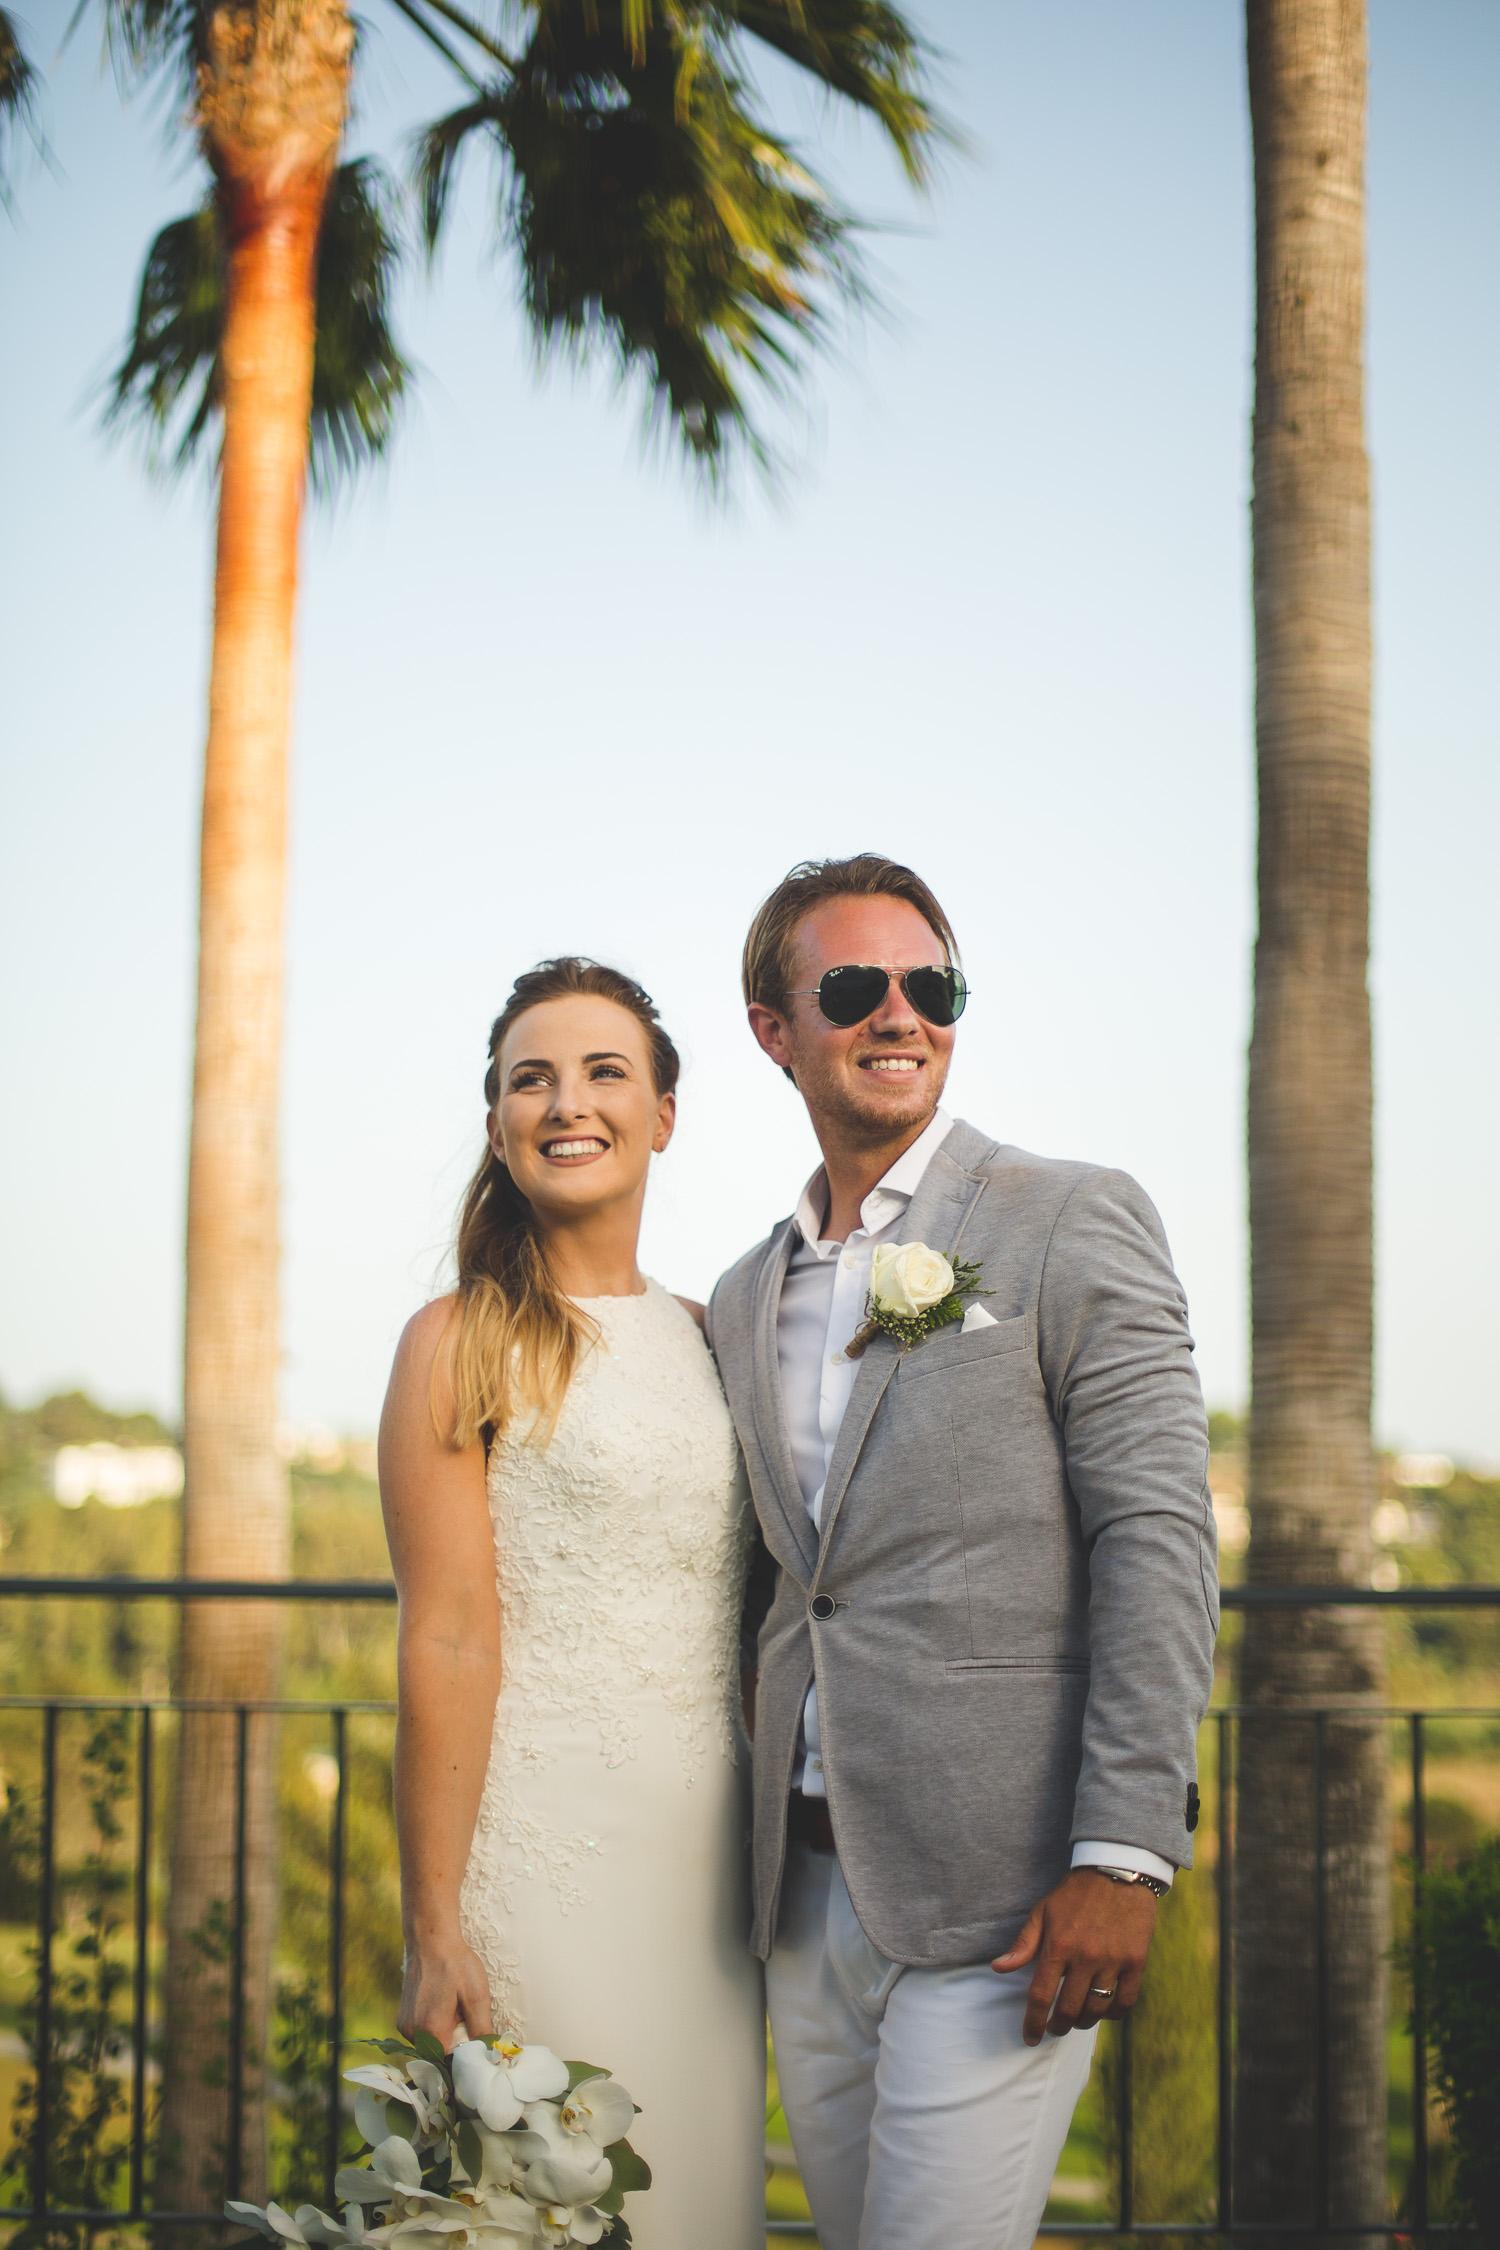 Surrey Wedding Photographer Kit Myers Paige Craig Spain130.jpg